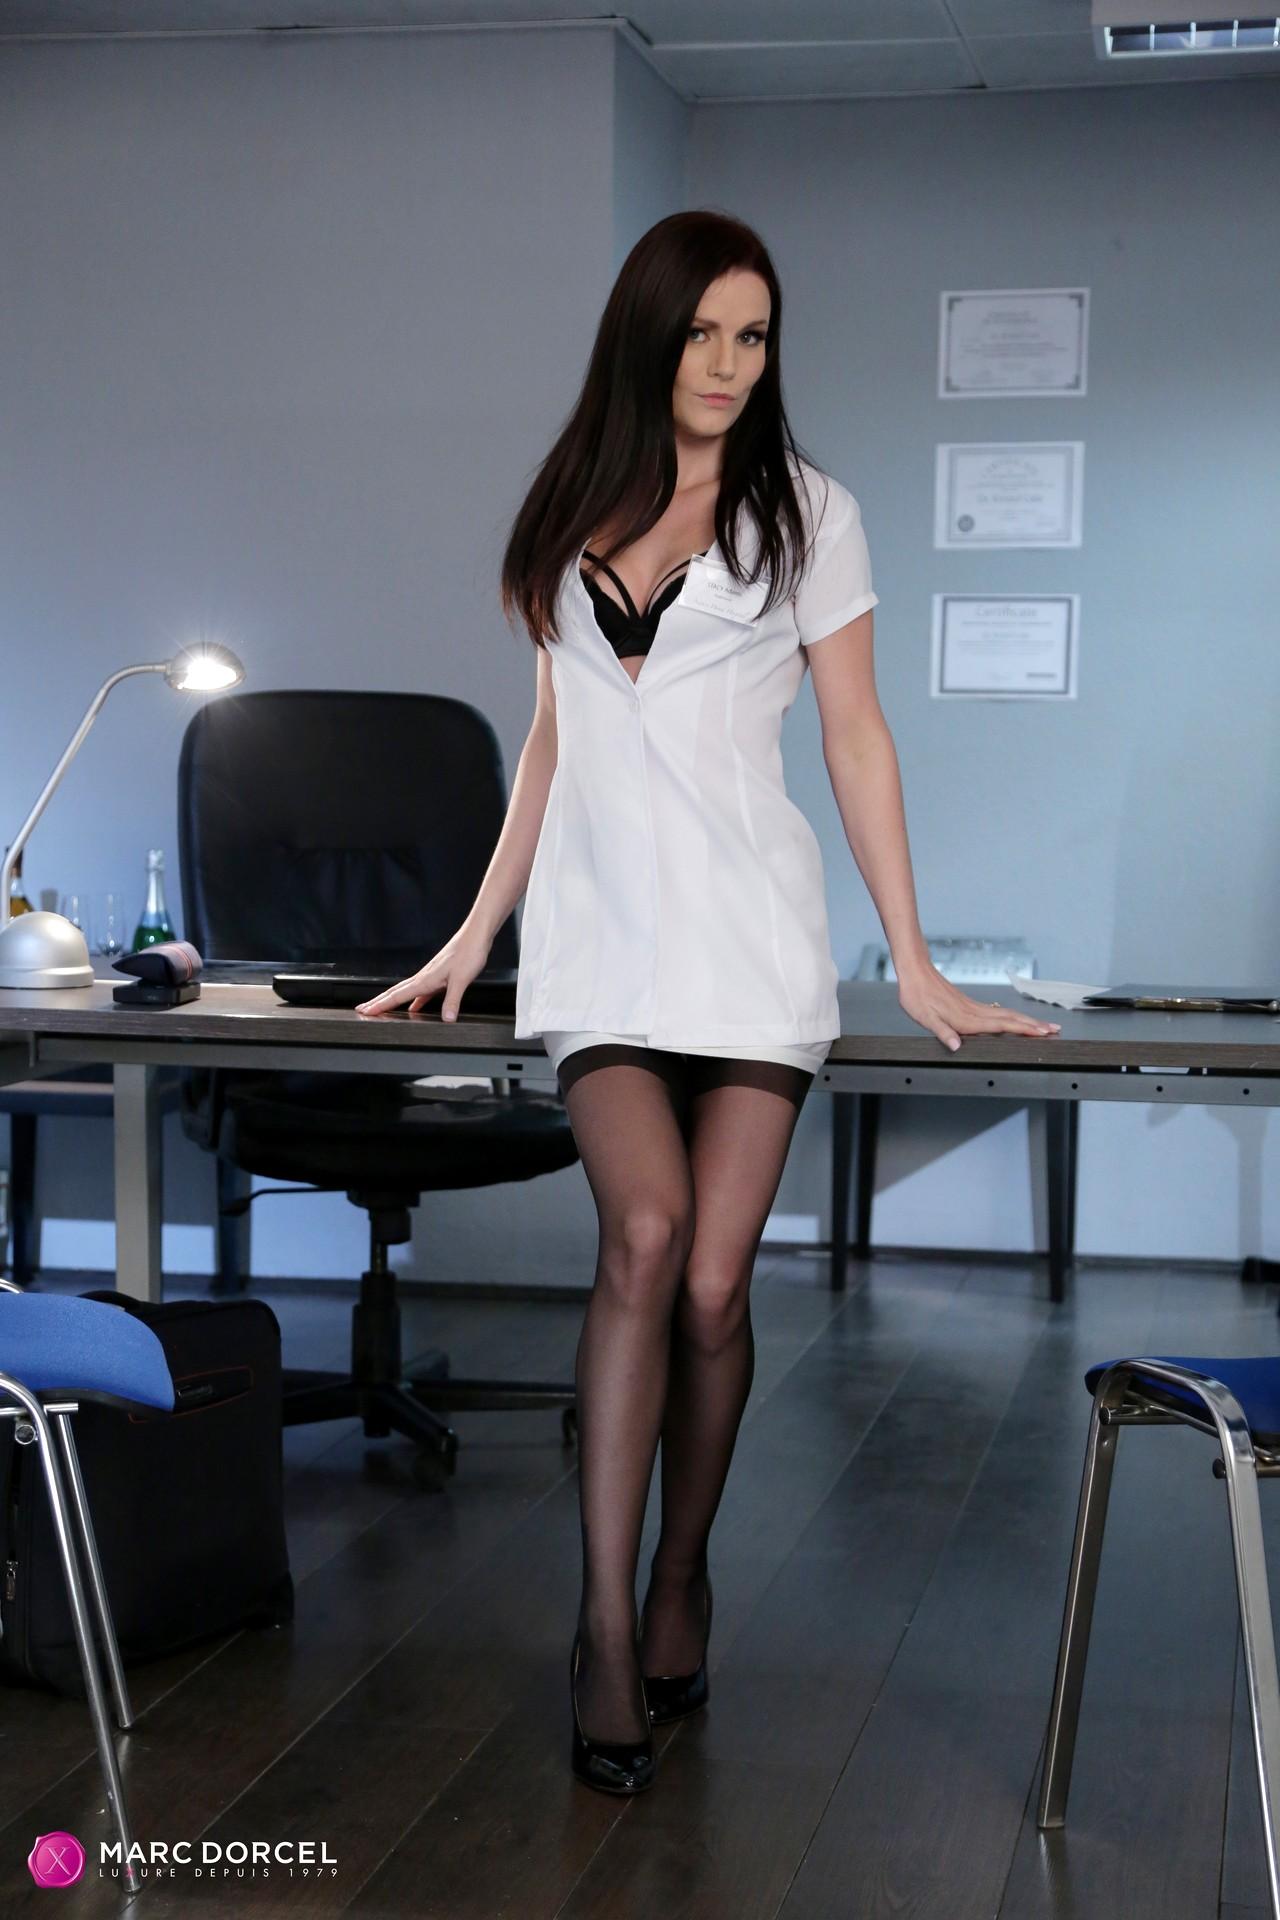 Sex Hd Mobile Pics Dorcel Club Laure Valentin Online Nurse Sexporn-1409